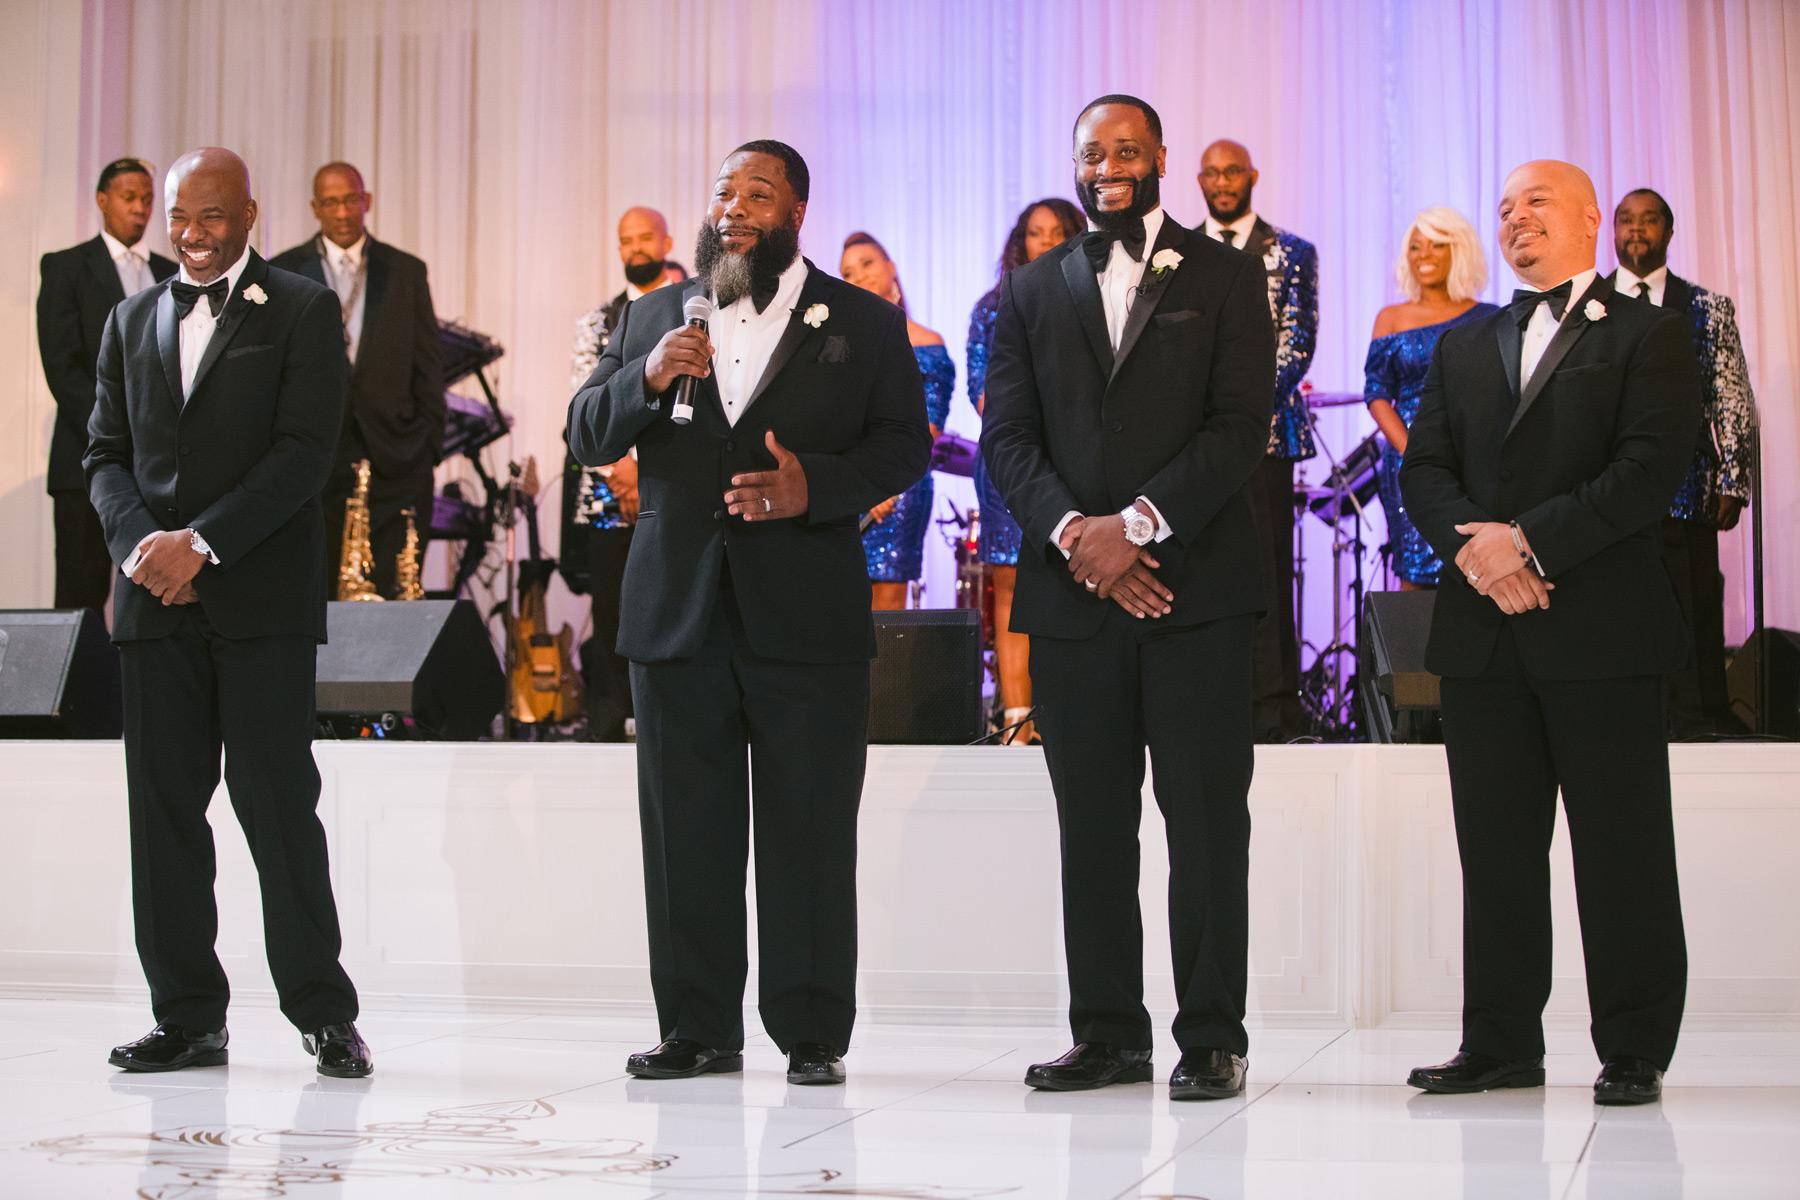 St-Regis-Wedding-Atlanta-0914-0074